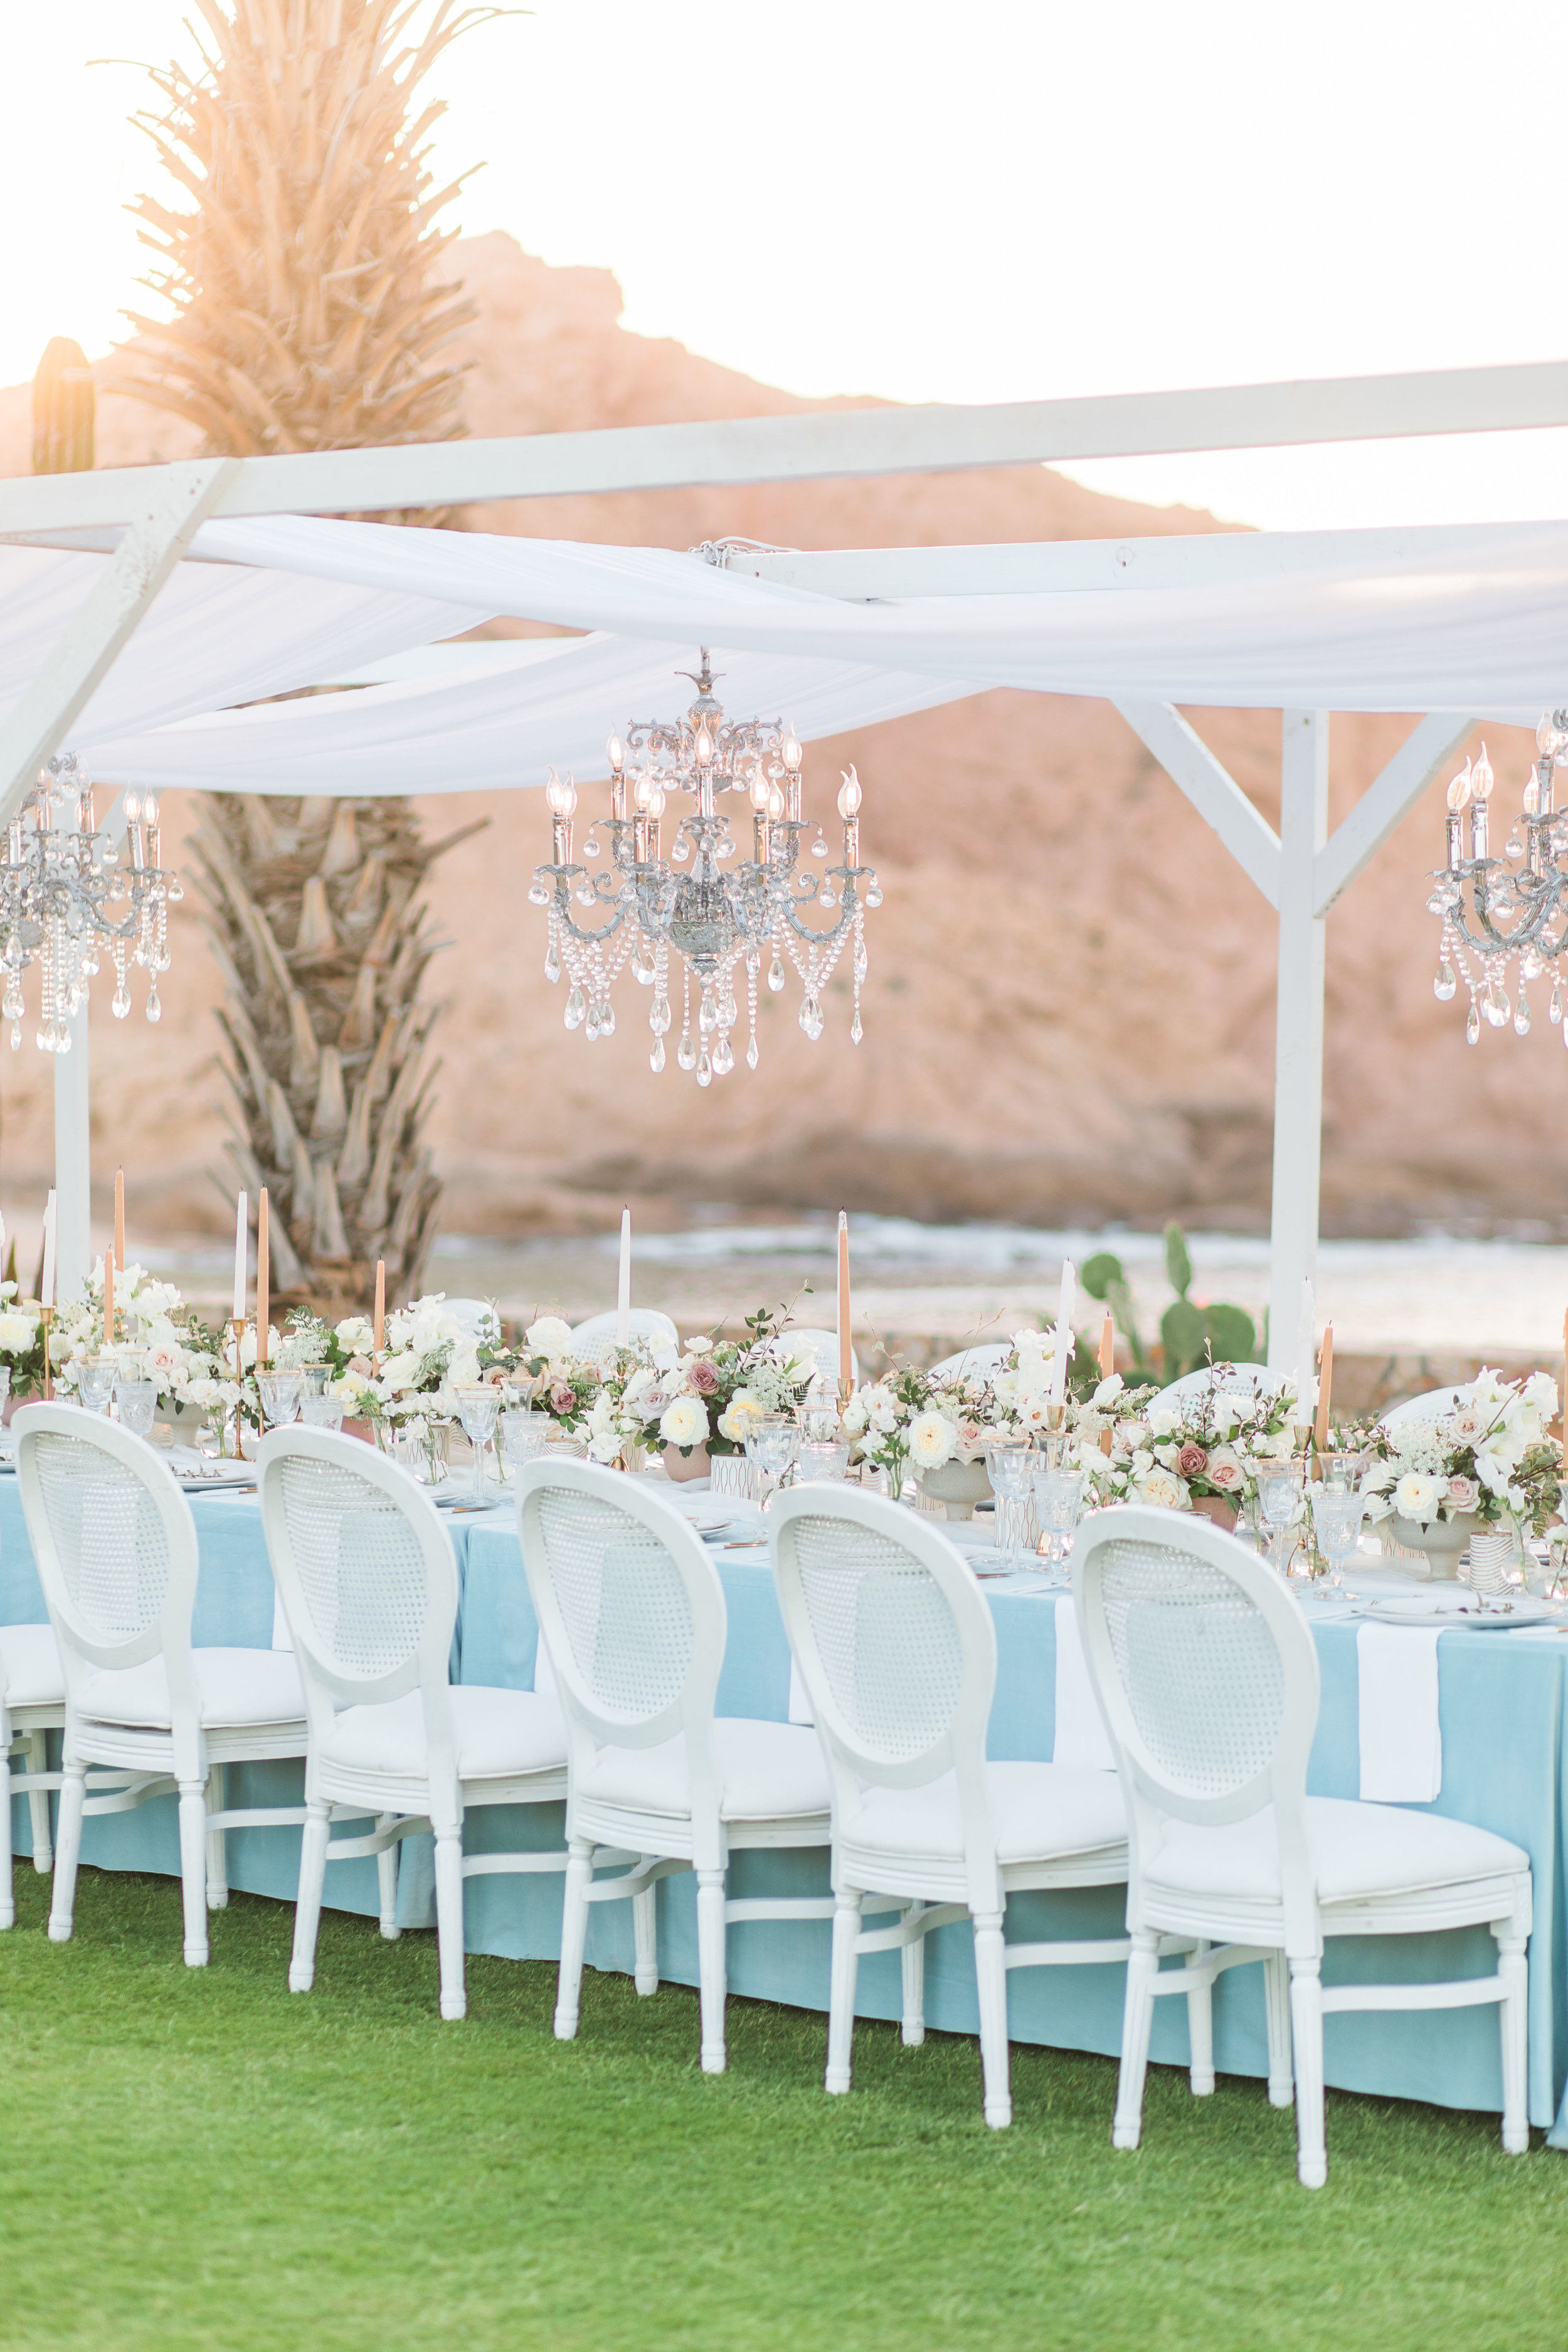 Montage-Cabo-Wedding-Photos-JBJ-Pictures-11.jpg